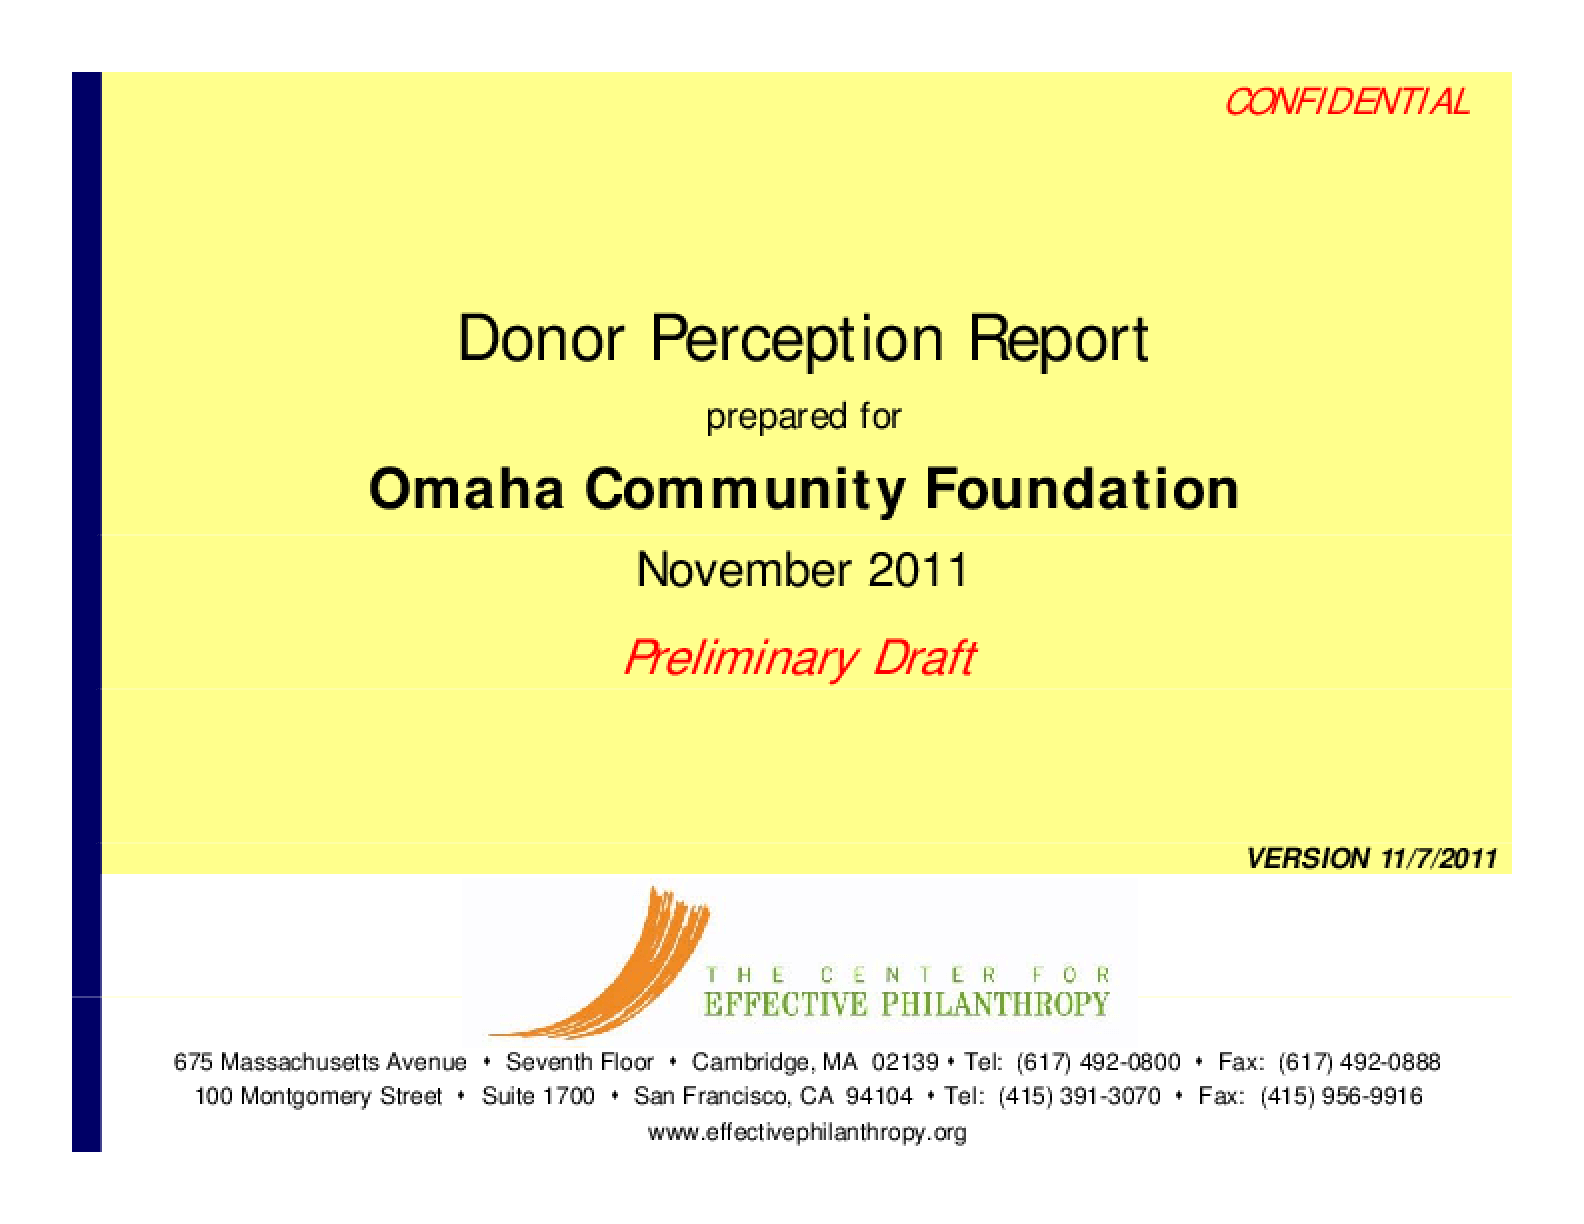 Donor Perception Report: Omaha Community Foundation